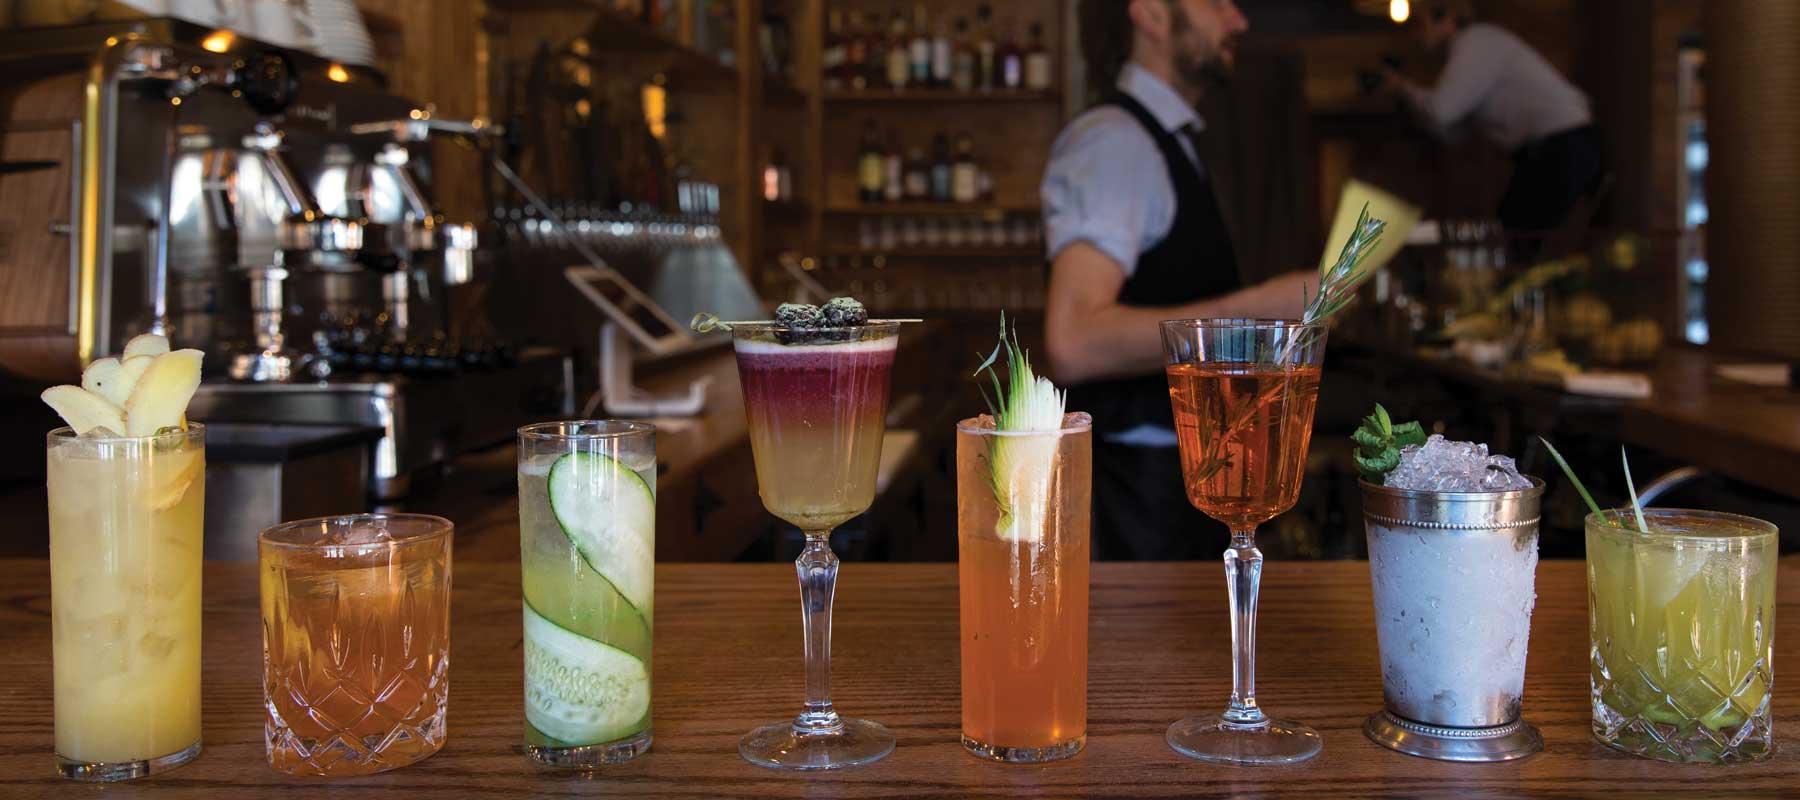 The Craftsman, Cocktails, Harlem, New York, Morningside Heights, Cocktails Craft Beers Coffee Cold Press